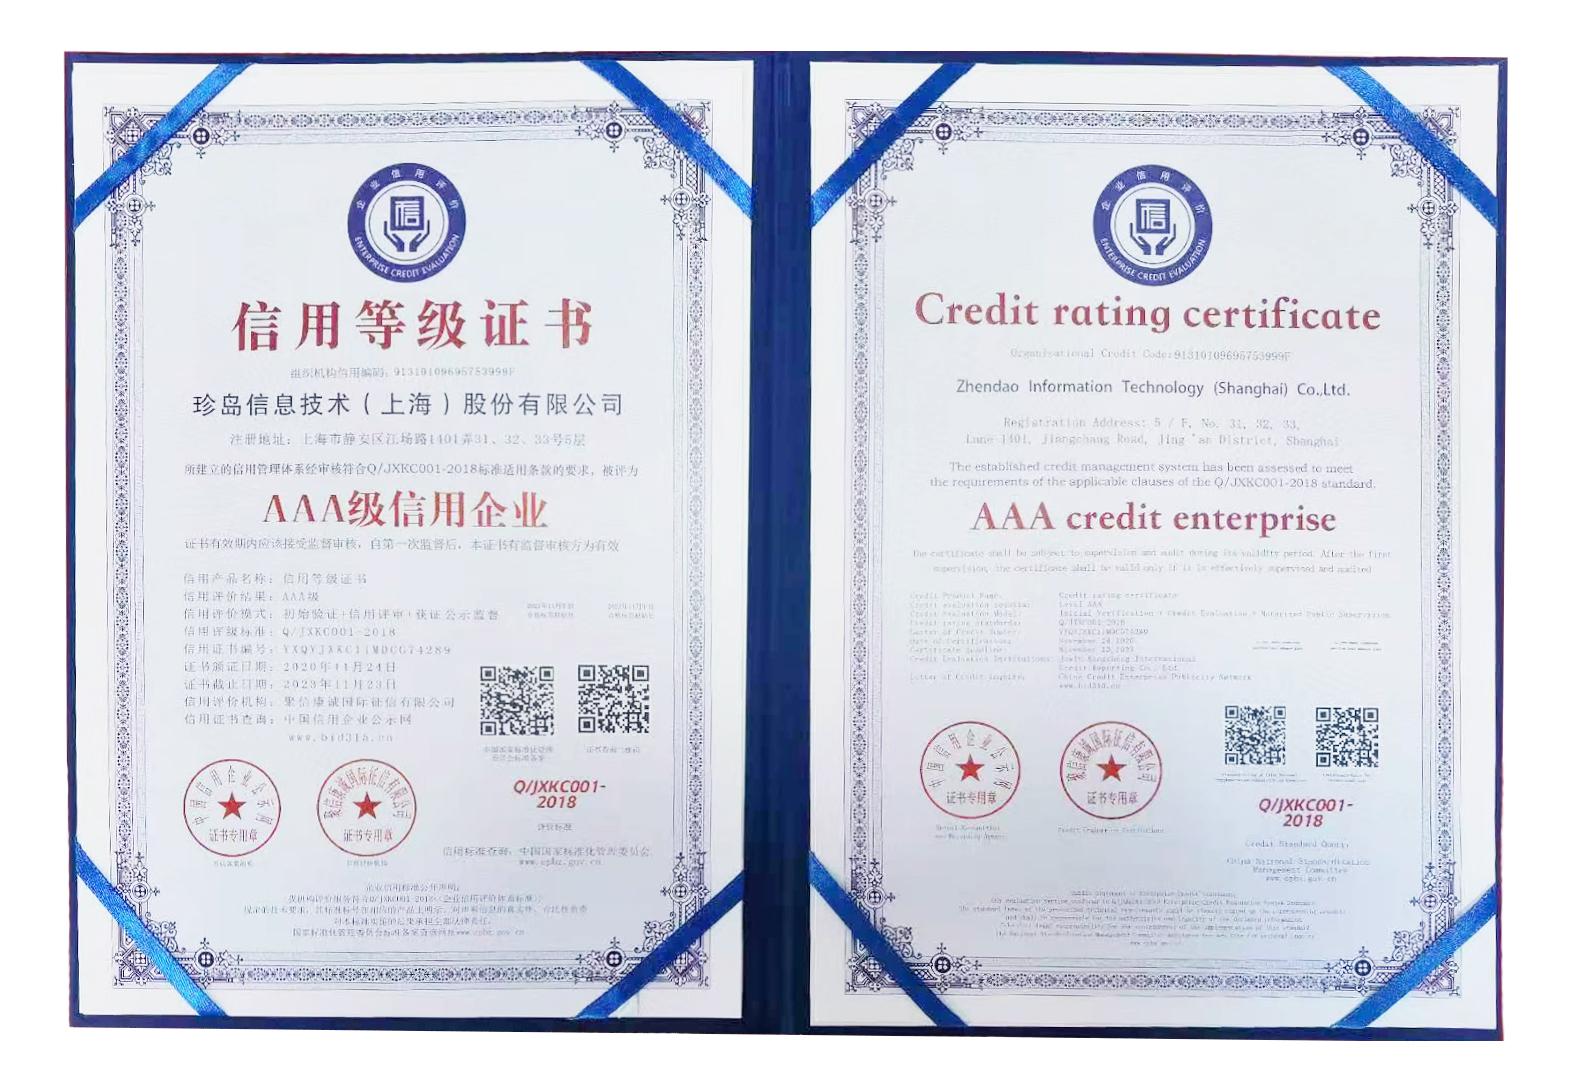 集团快讯   珍岛集团获AAA级信用企业及ISO9001、ISO14001、ISO45001系列认证